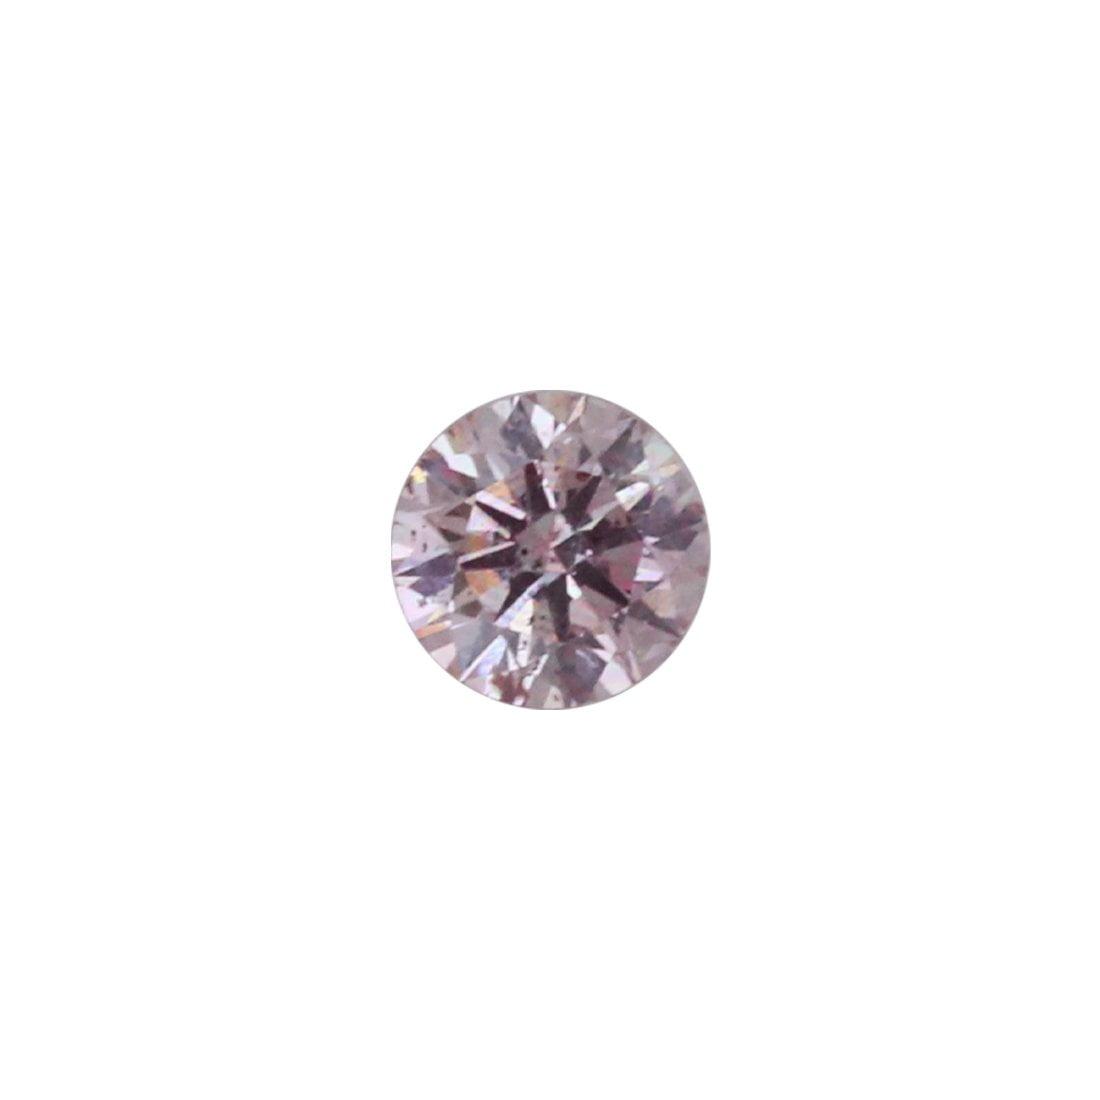 0.08ct Natural Fancy Pink, 7P Argyle Diamond